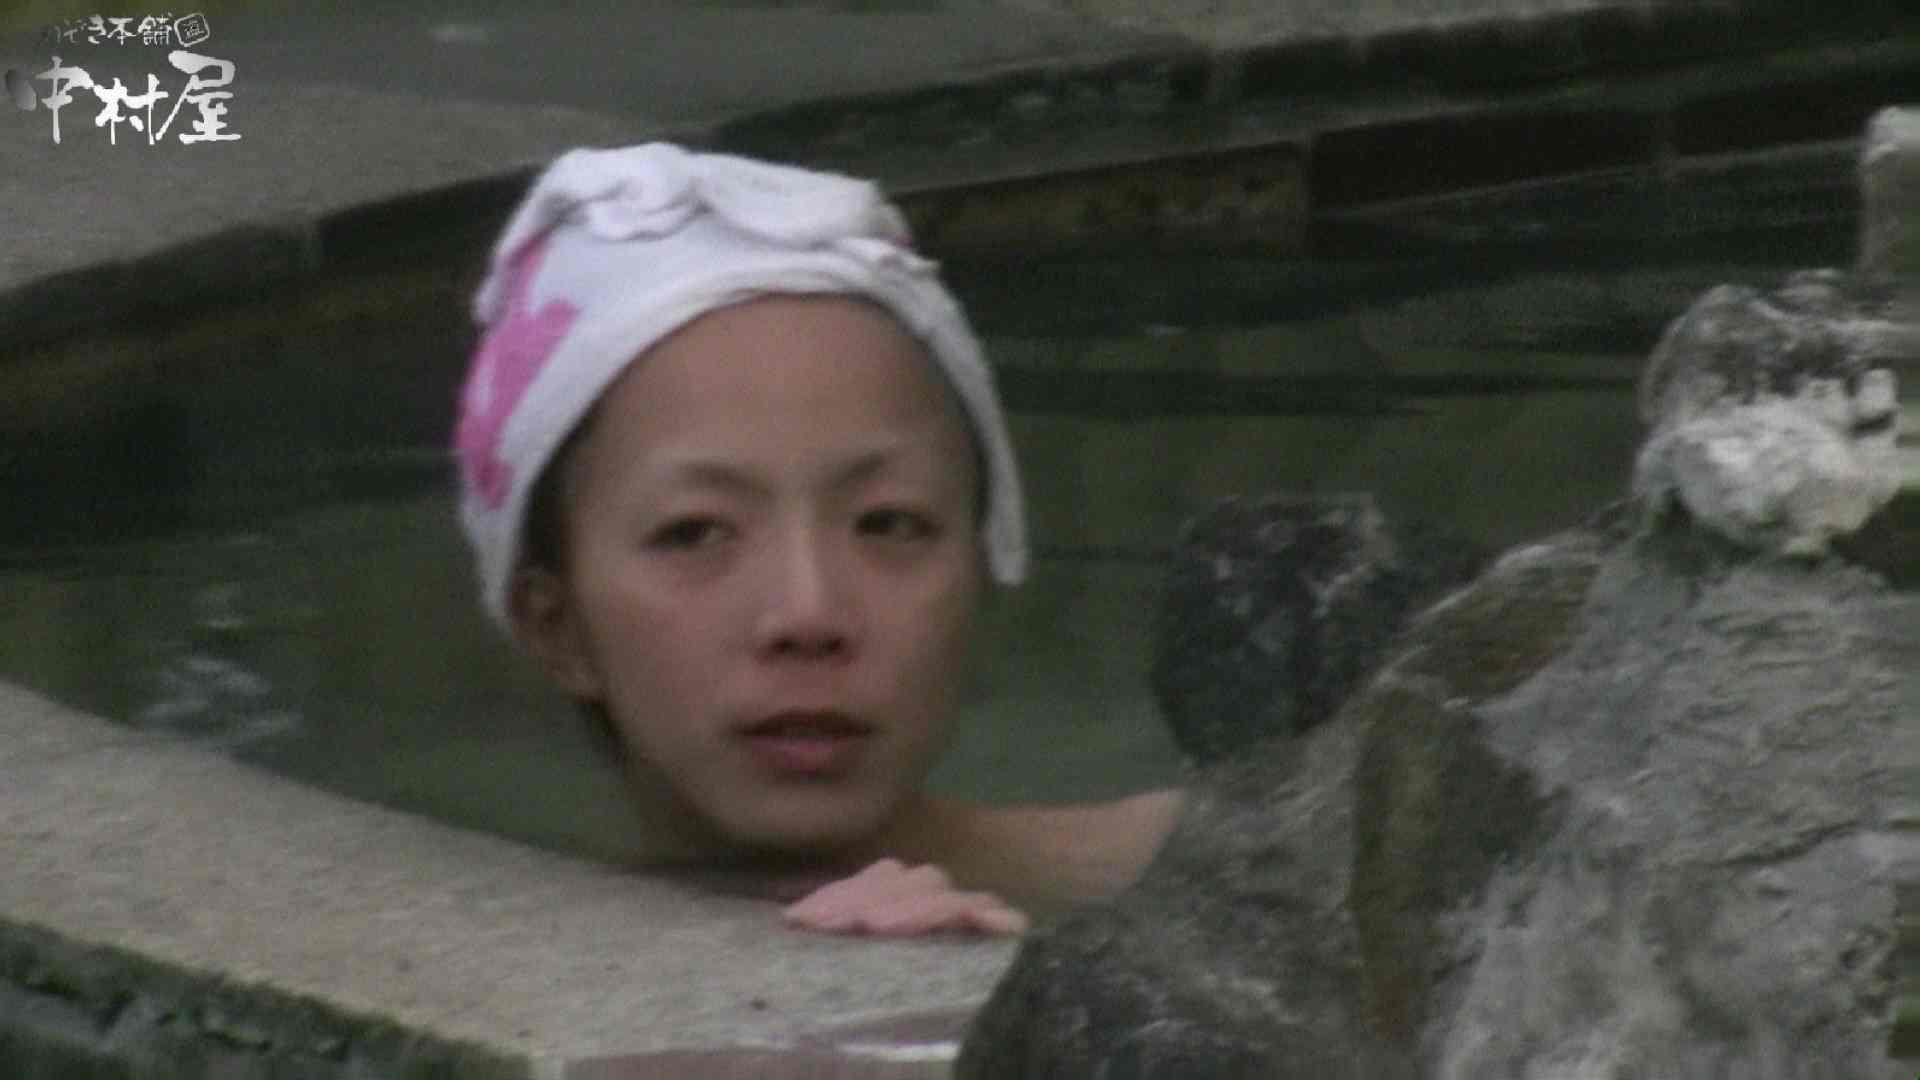 Aquaな露天風呂Vol.929 露天風呂 セックス無修正動画無料 104連発 83